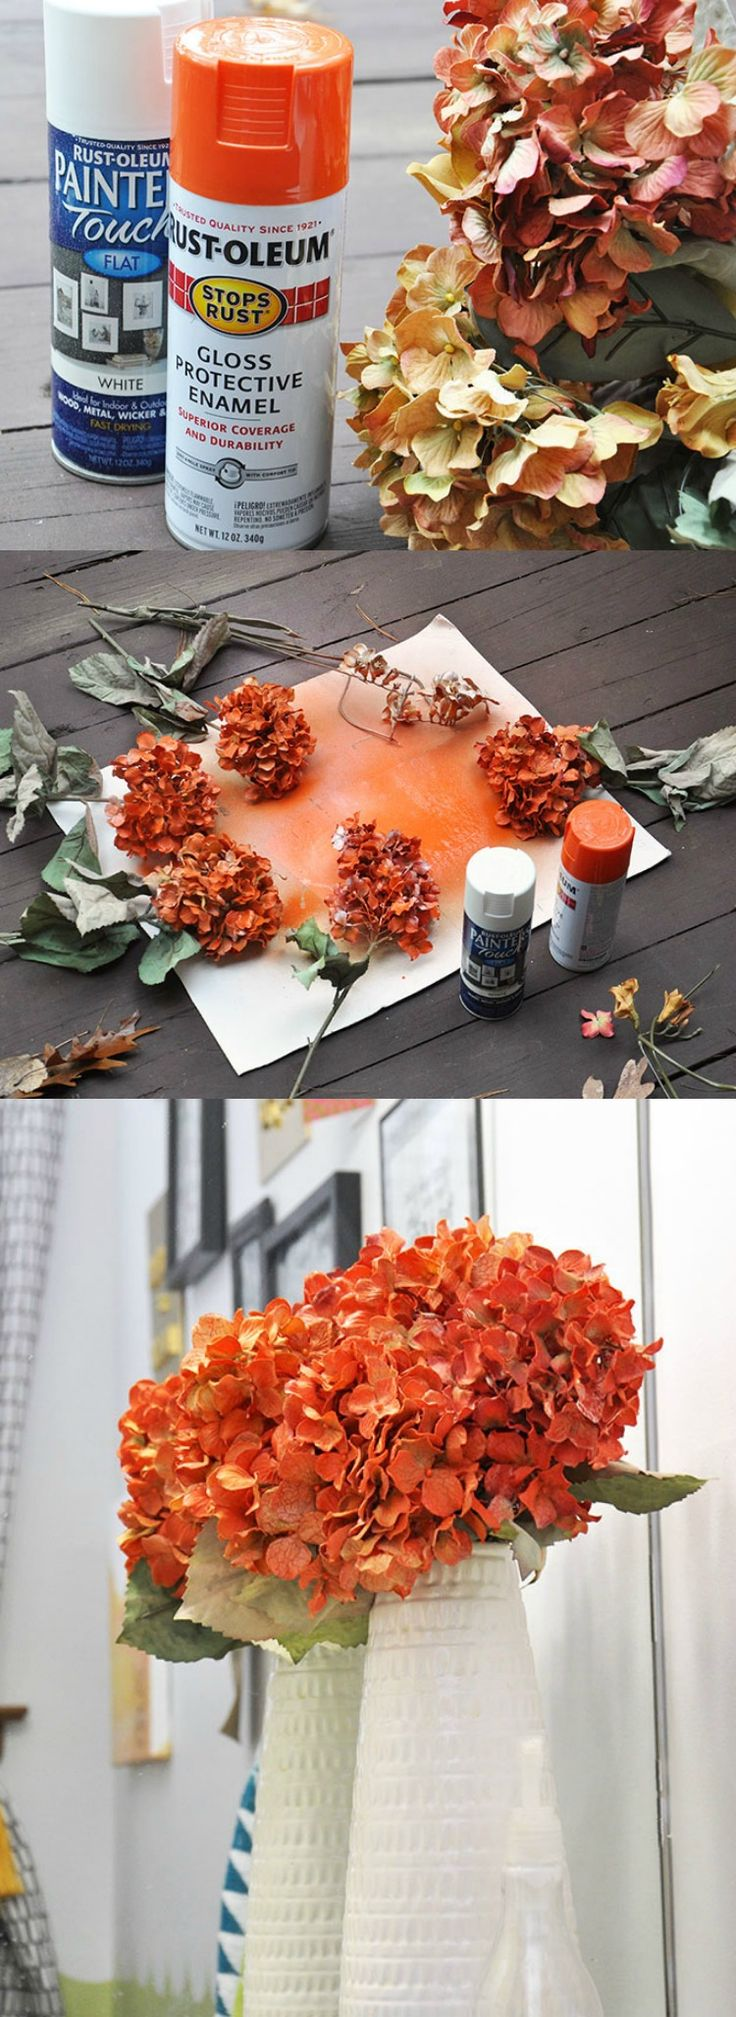 Diy Spray Paint Ideas 47 - 38+ Beautiful DIY Spray Paint Ideas